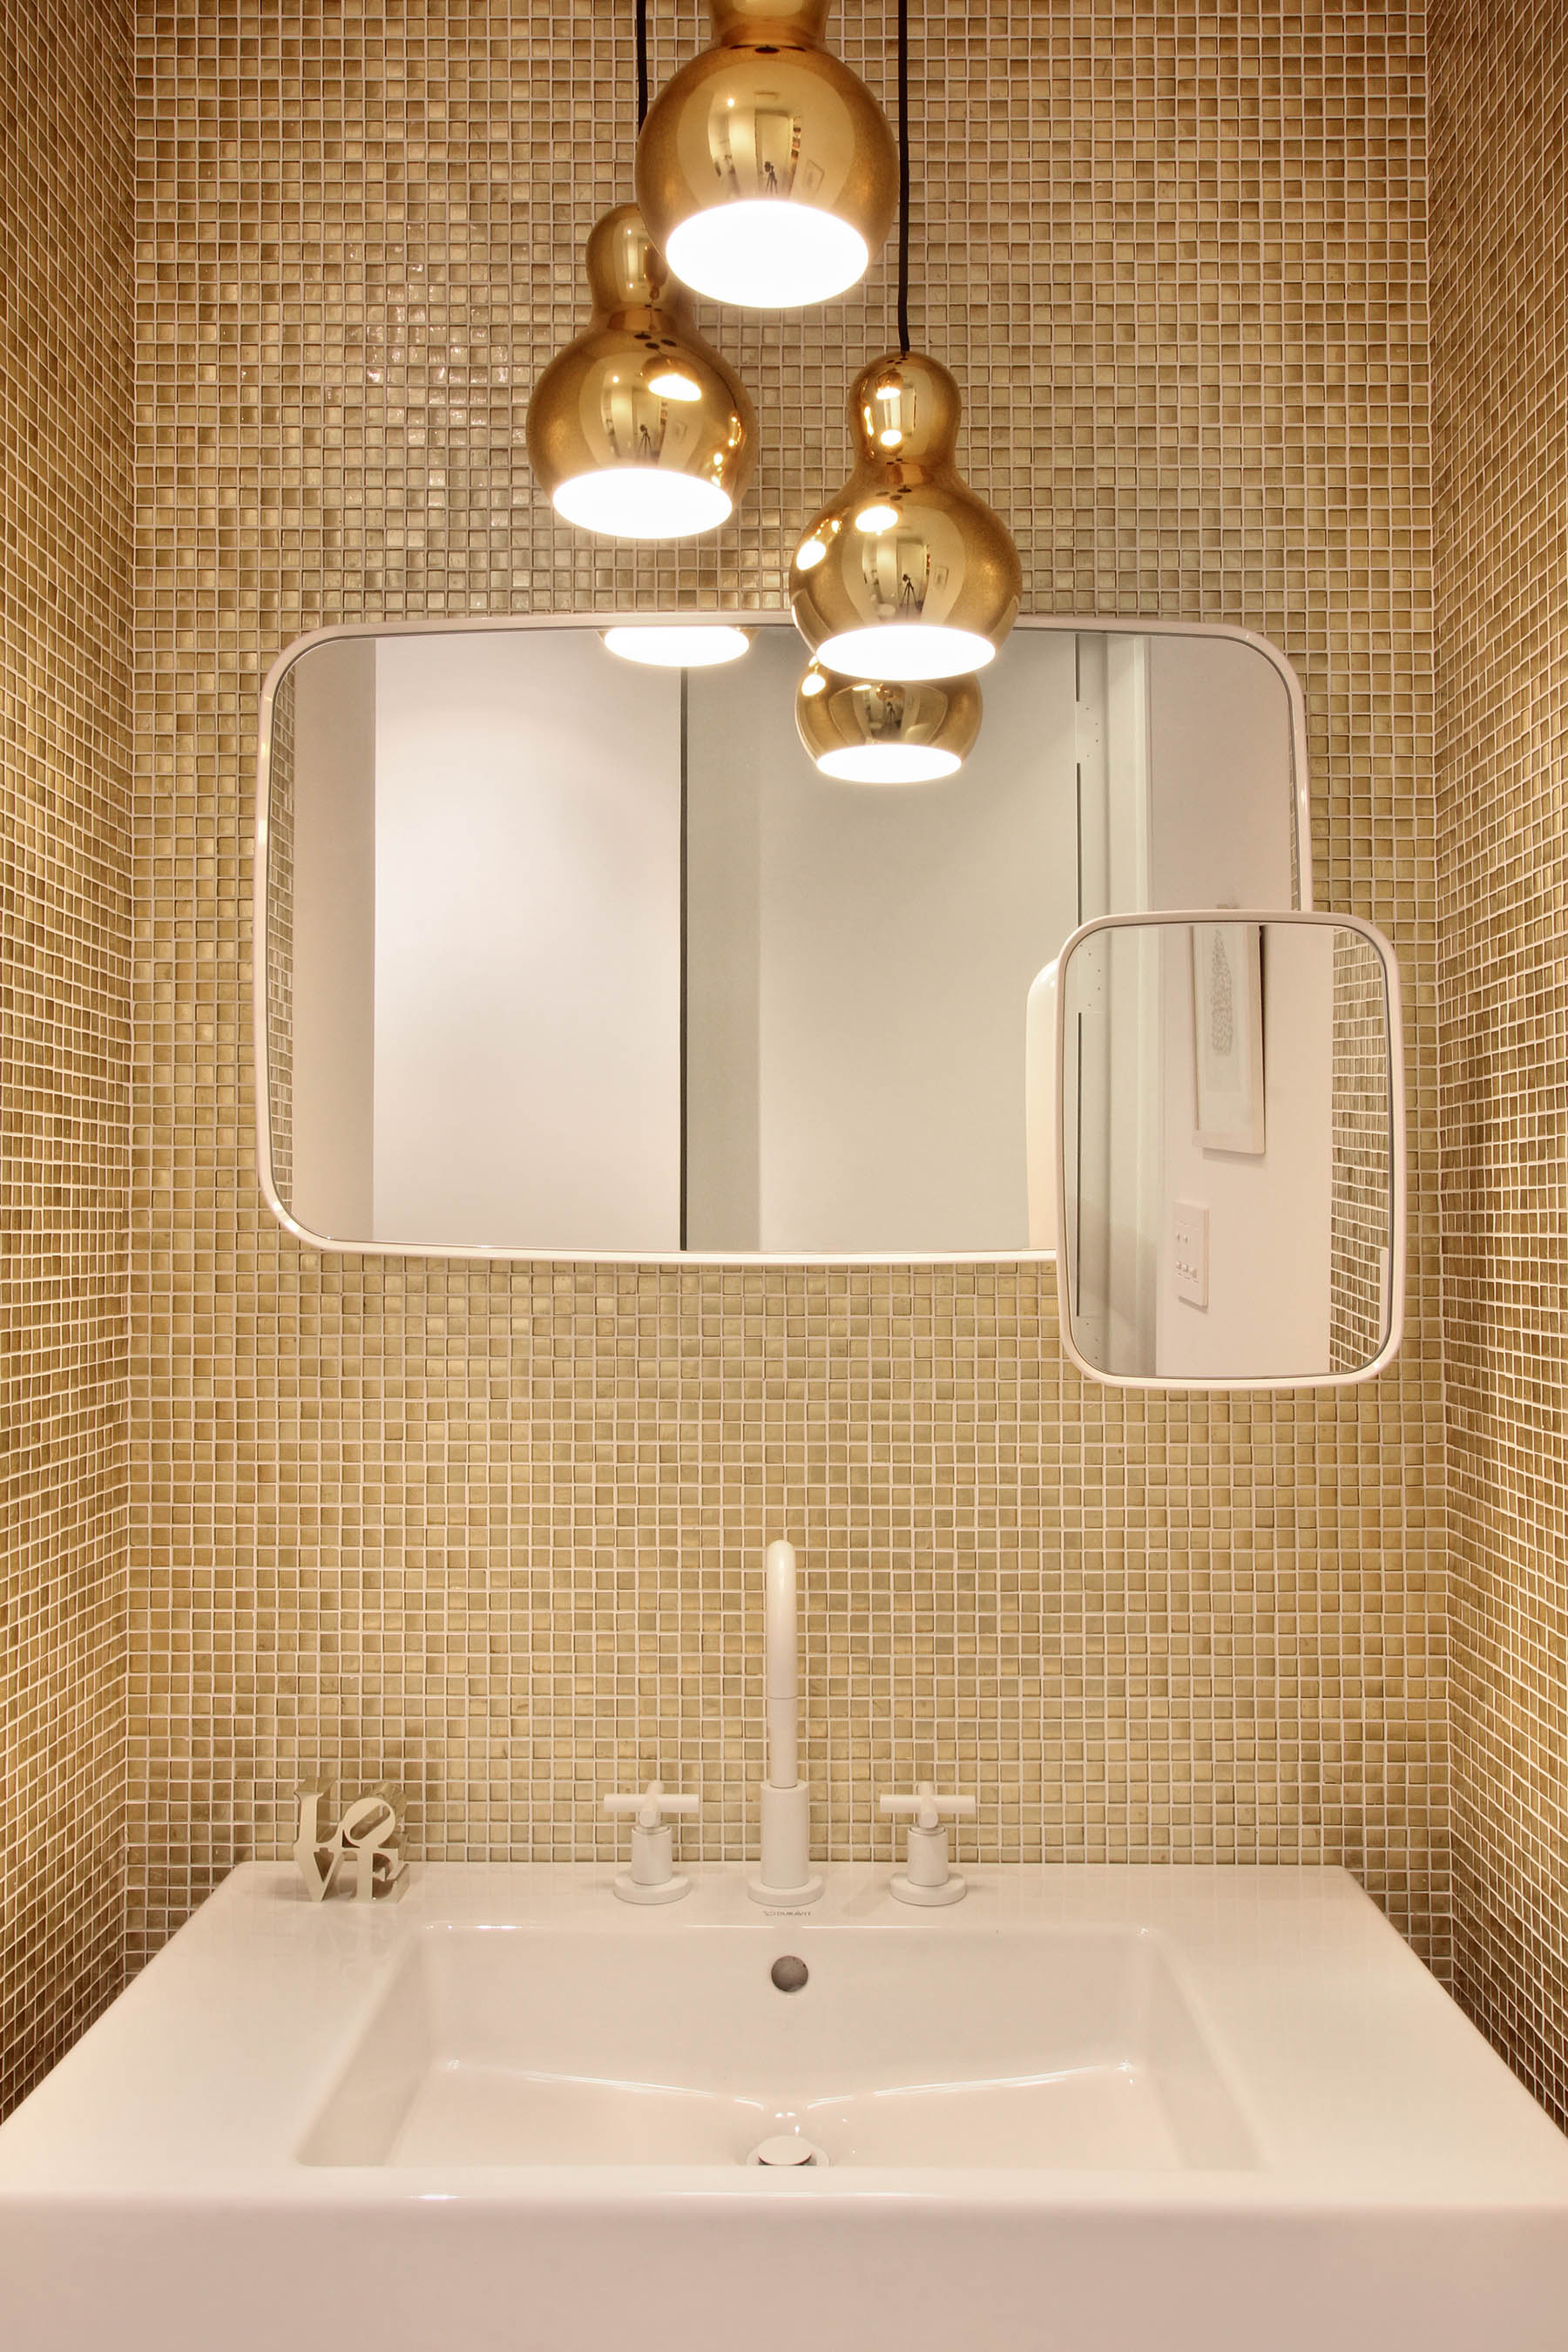 ghislaine viñas interior design goldstein 2-3537